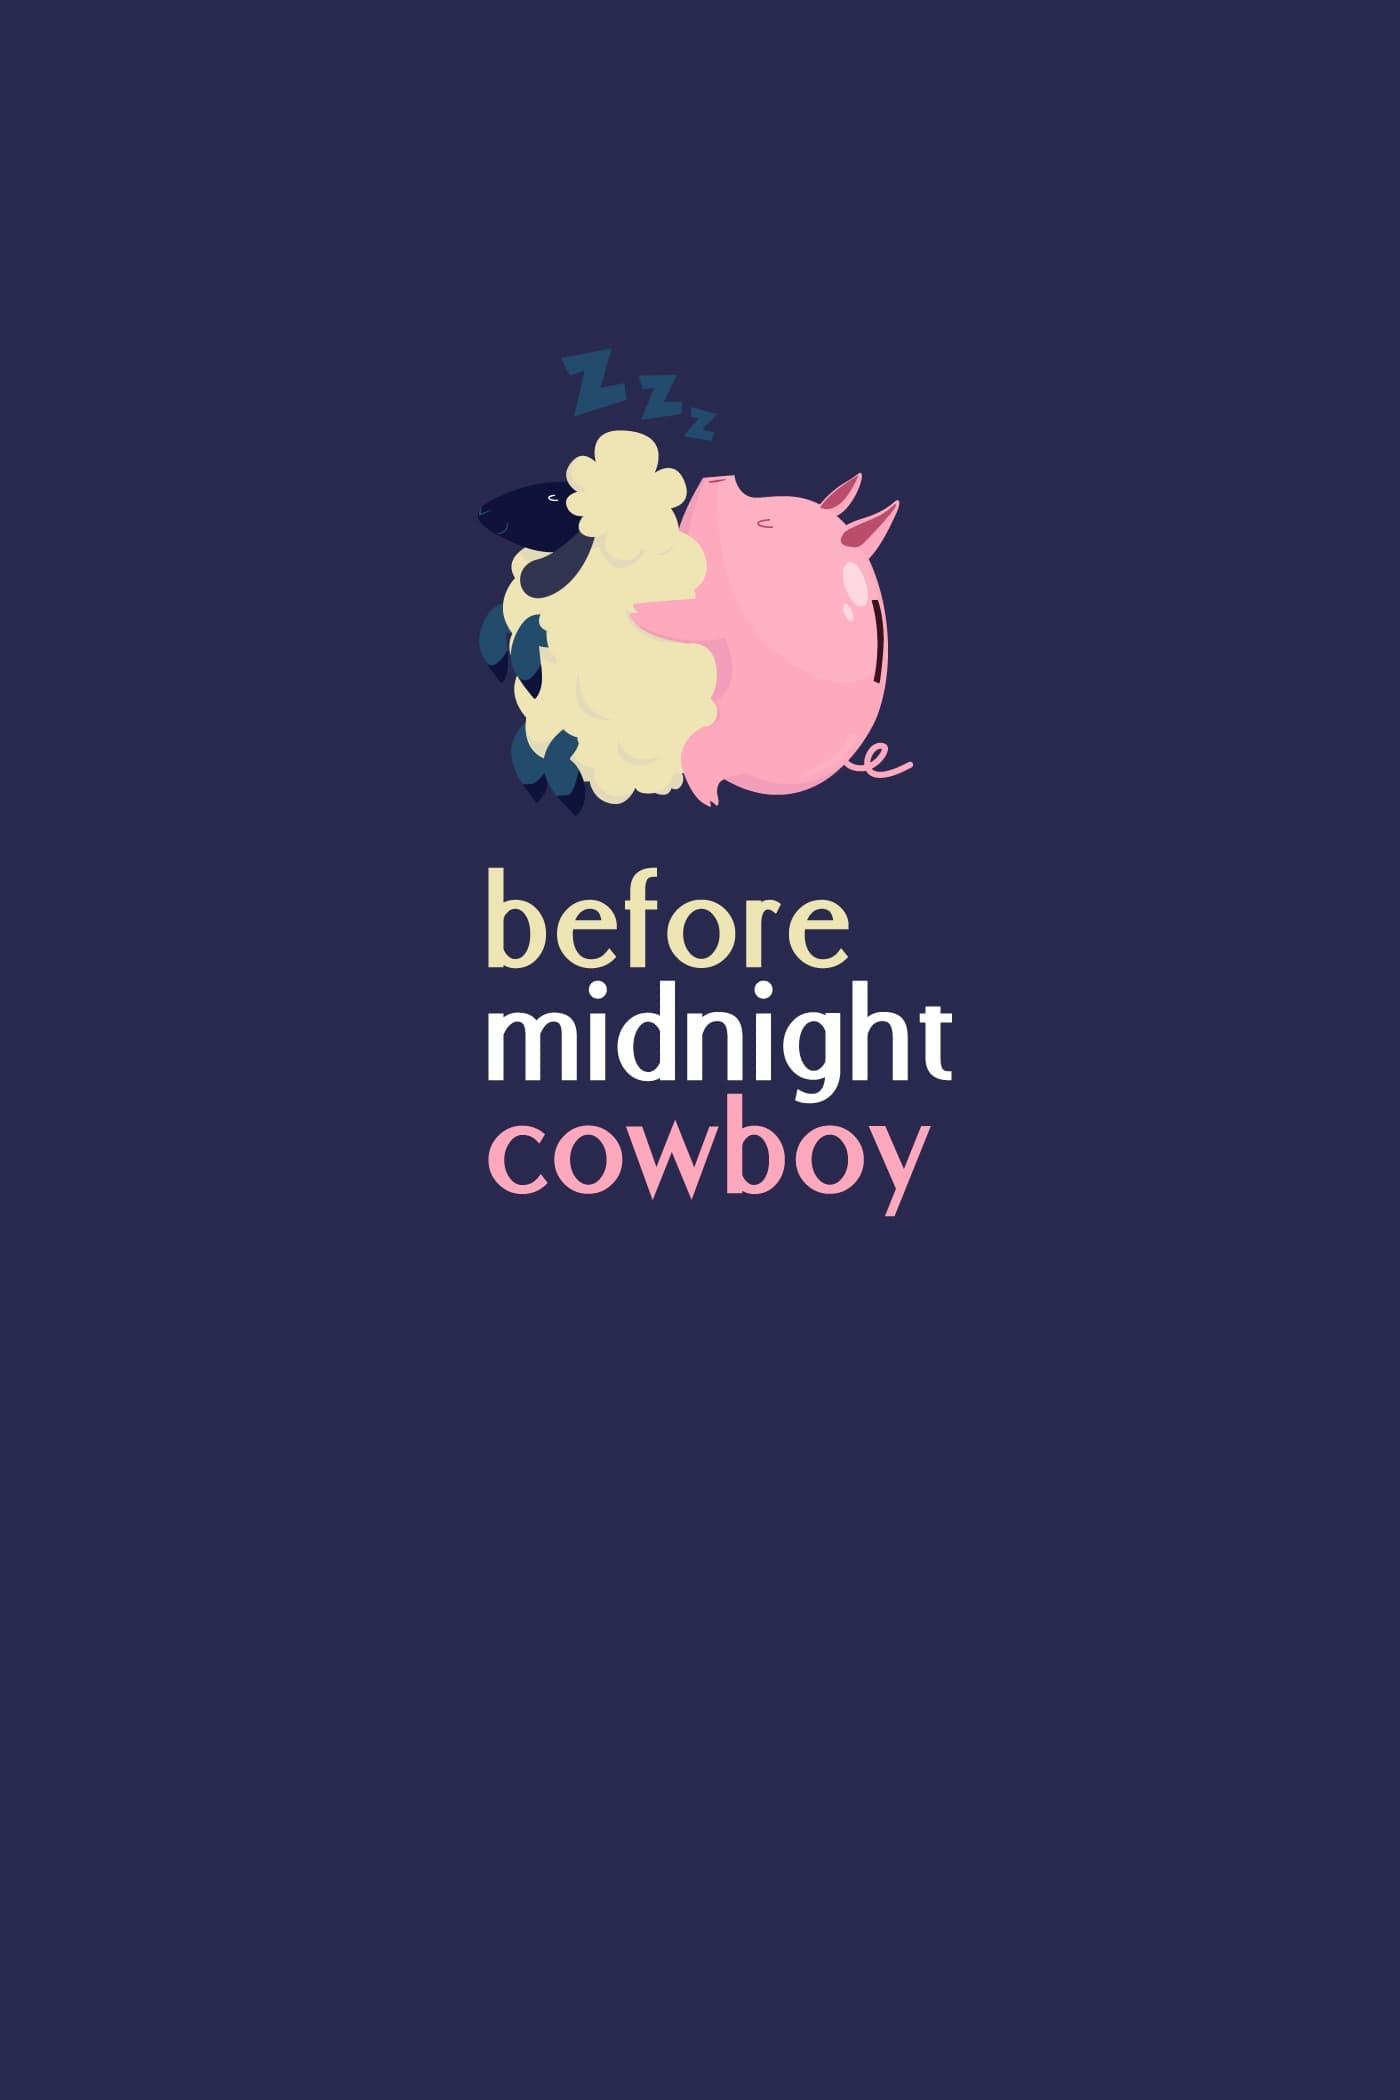 Before Midnight Cowboy